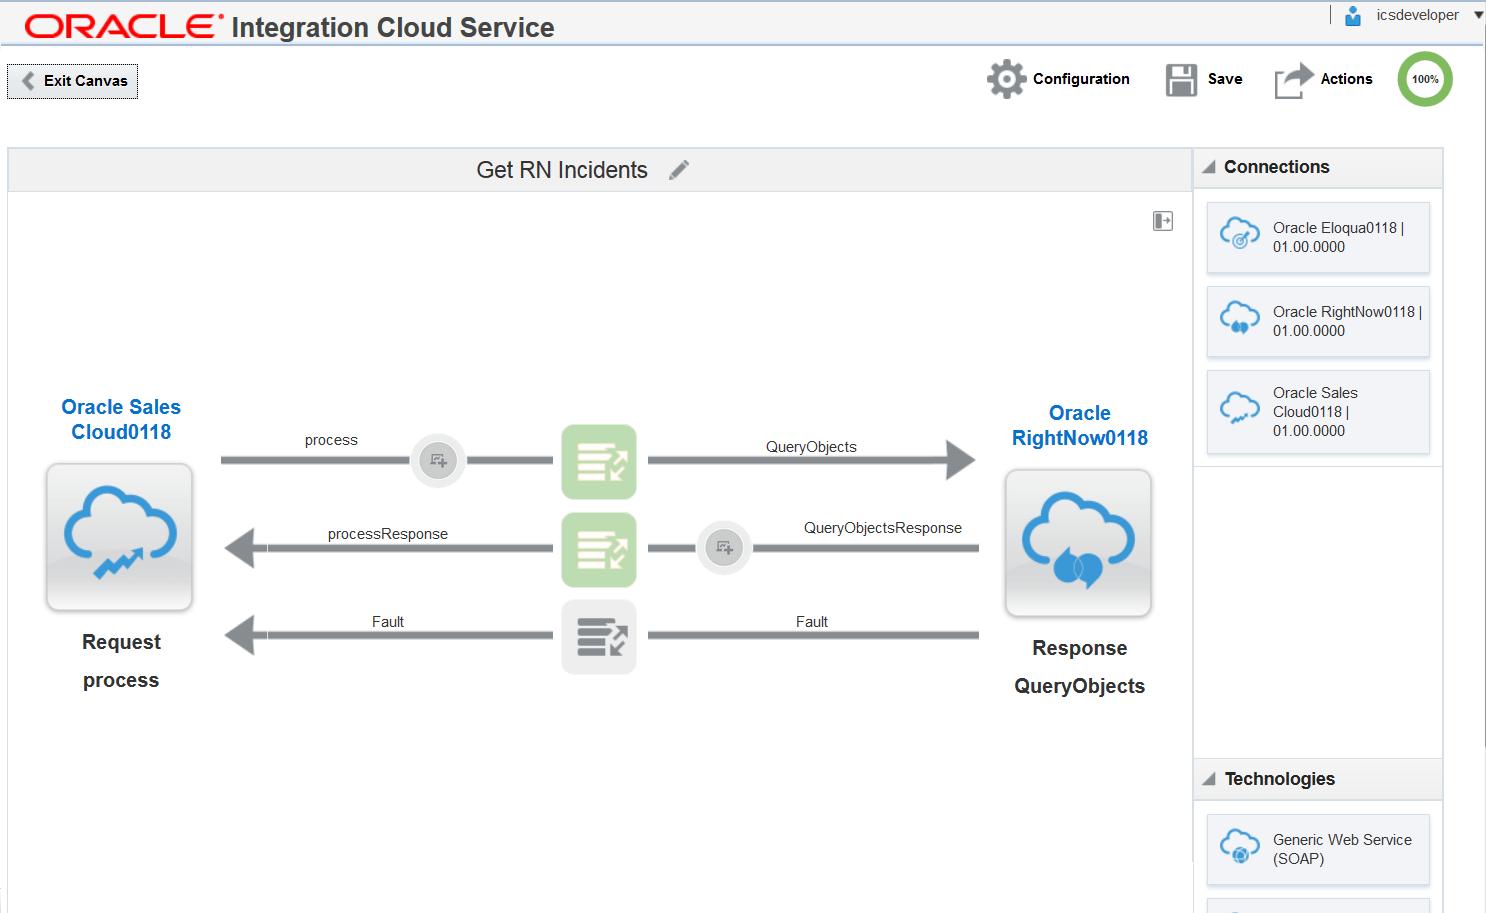 Oracle Integration Cloud Service Ics Preview